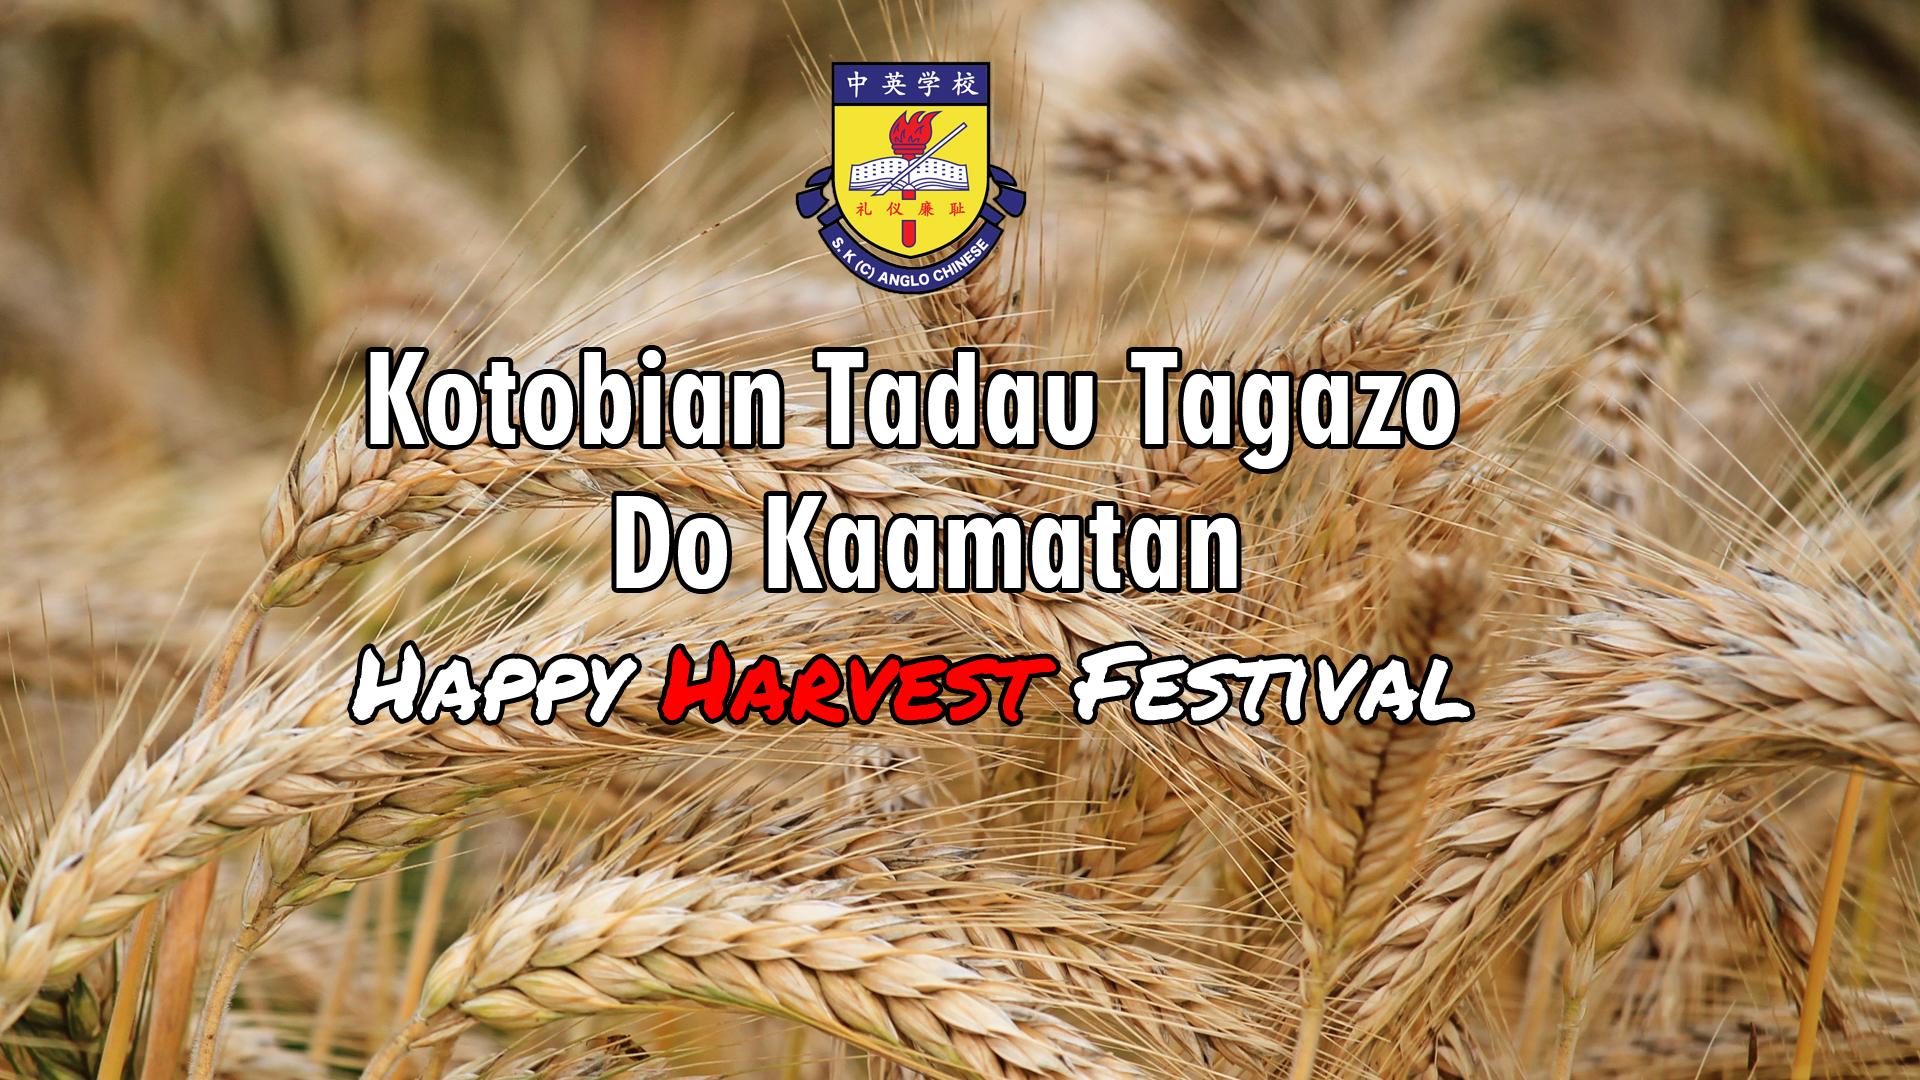 Happy Harvest Festival